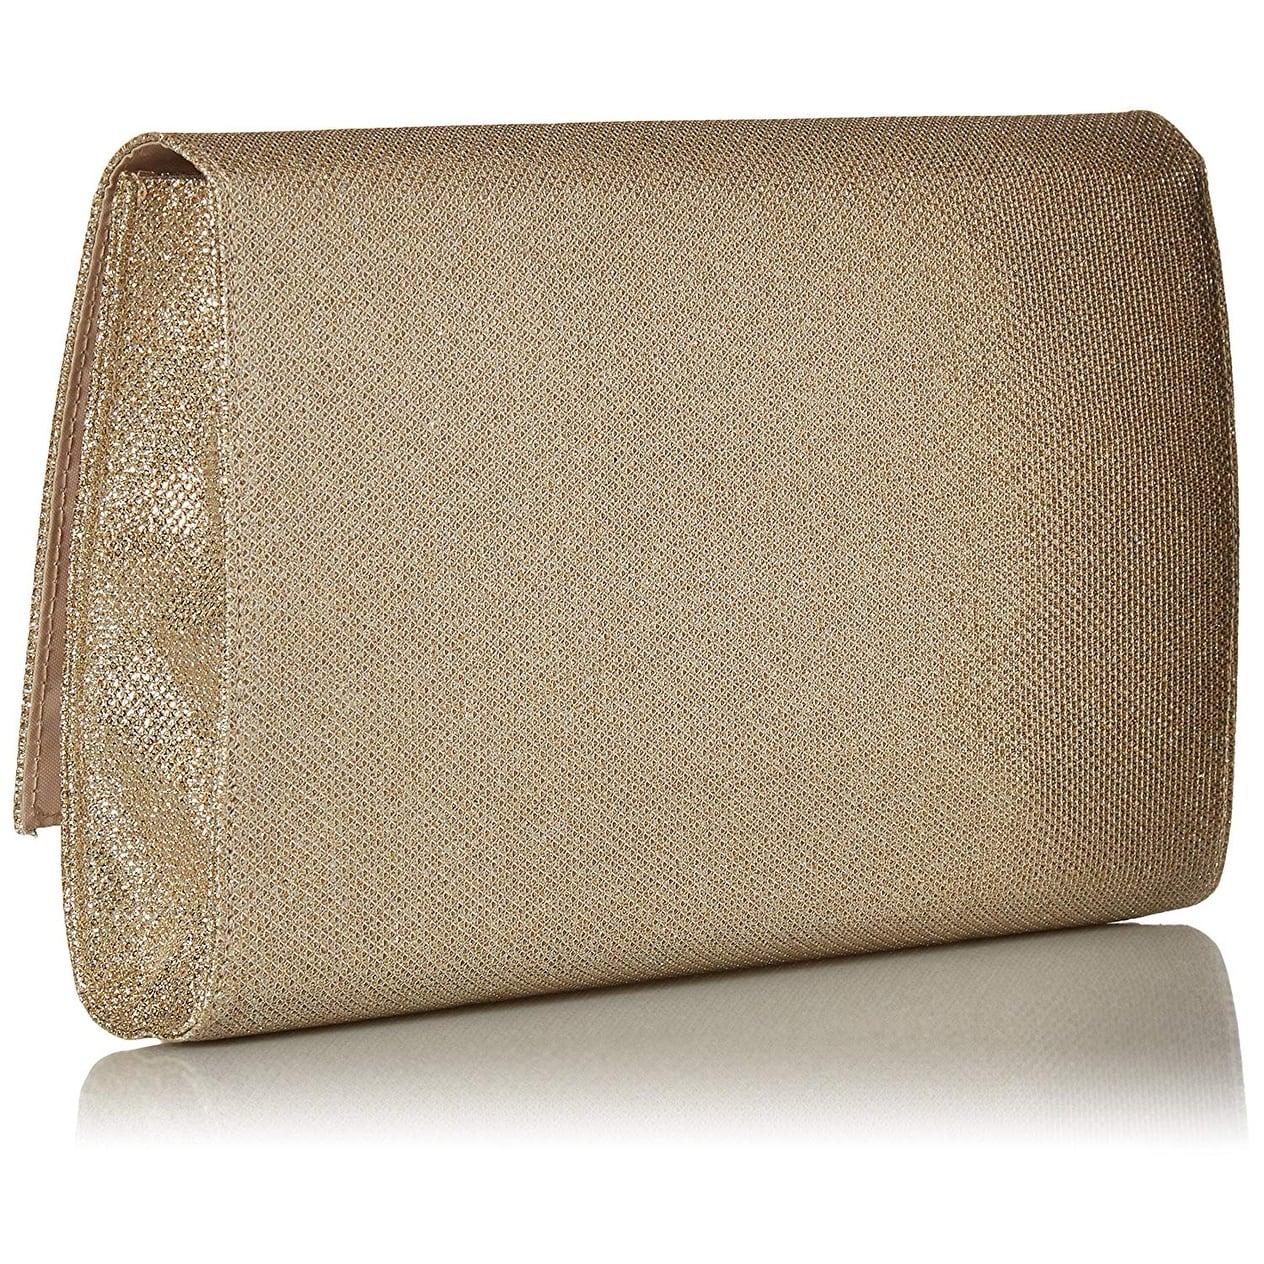 Jessica McClintock Nora Womens Envelope Clutch Evening Bag